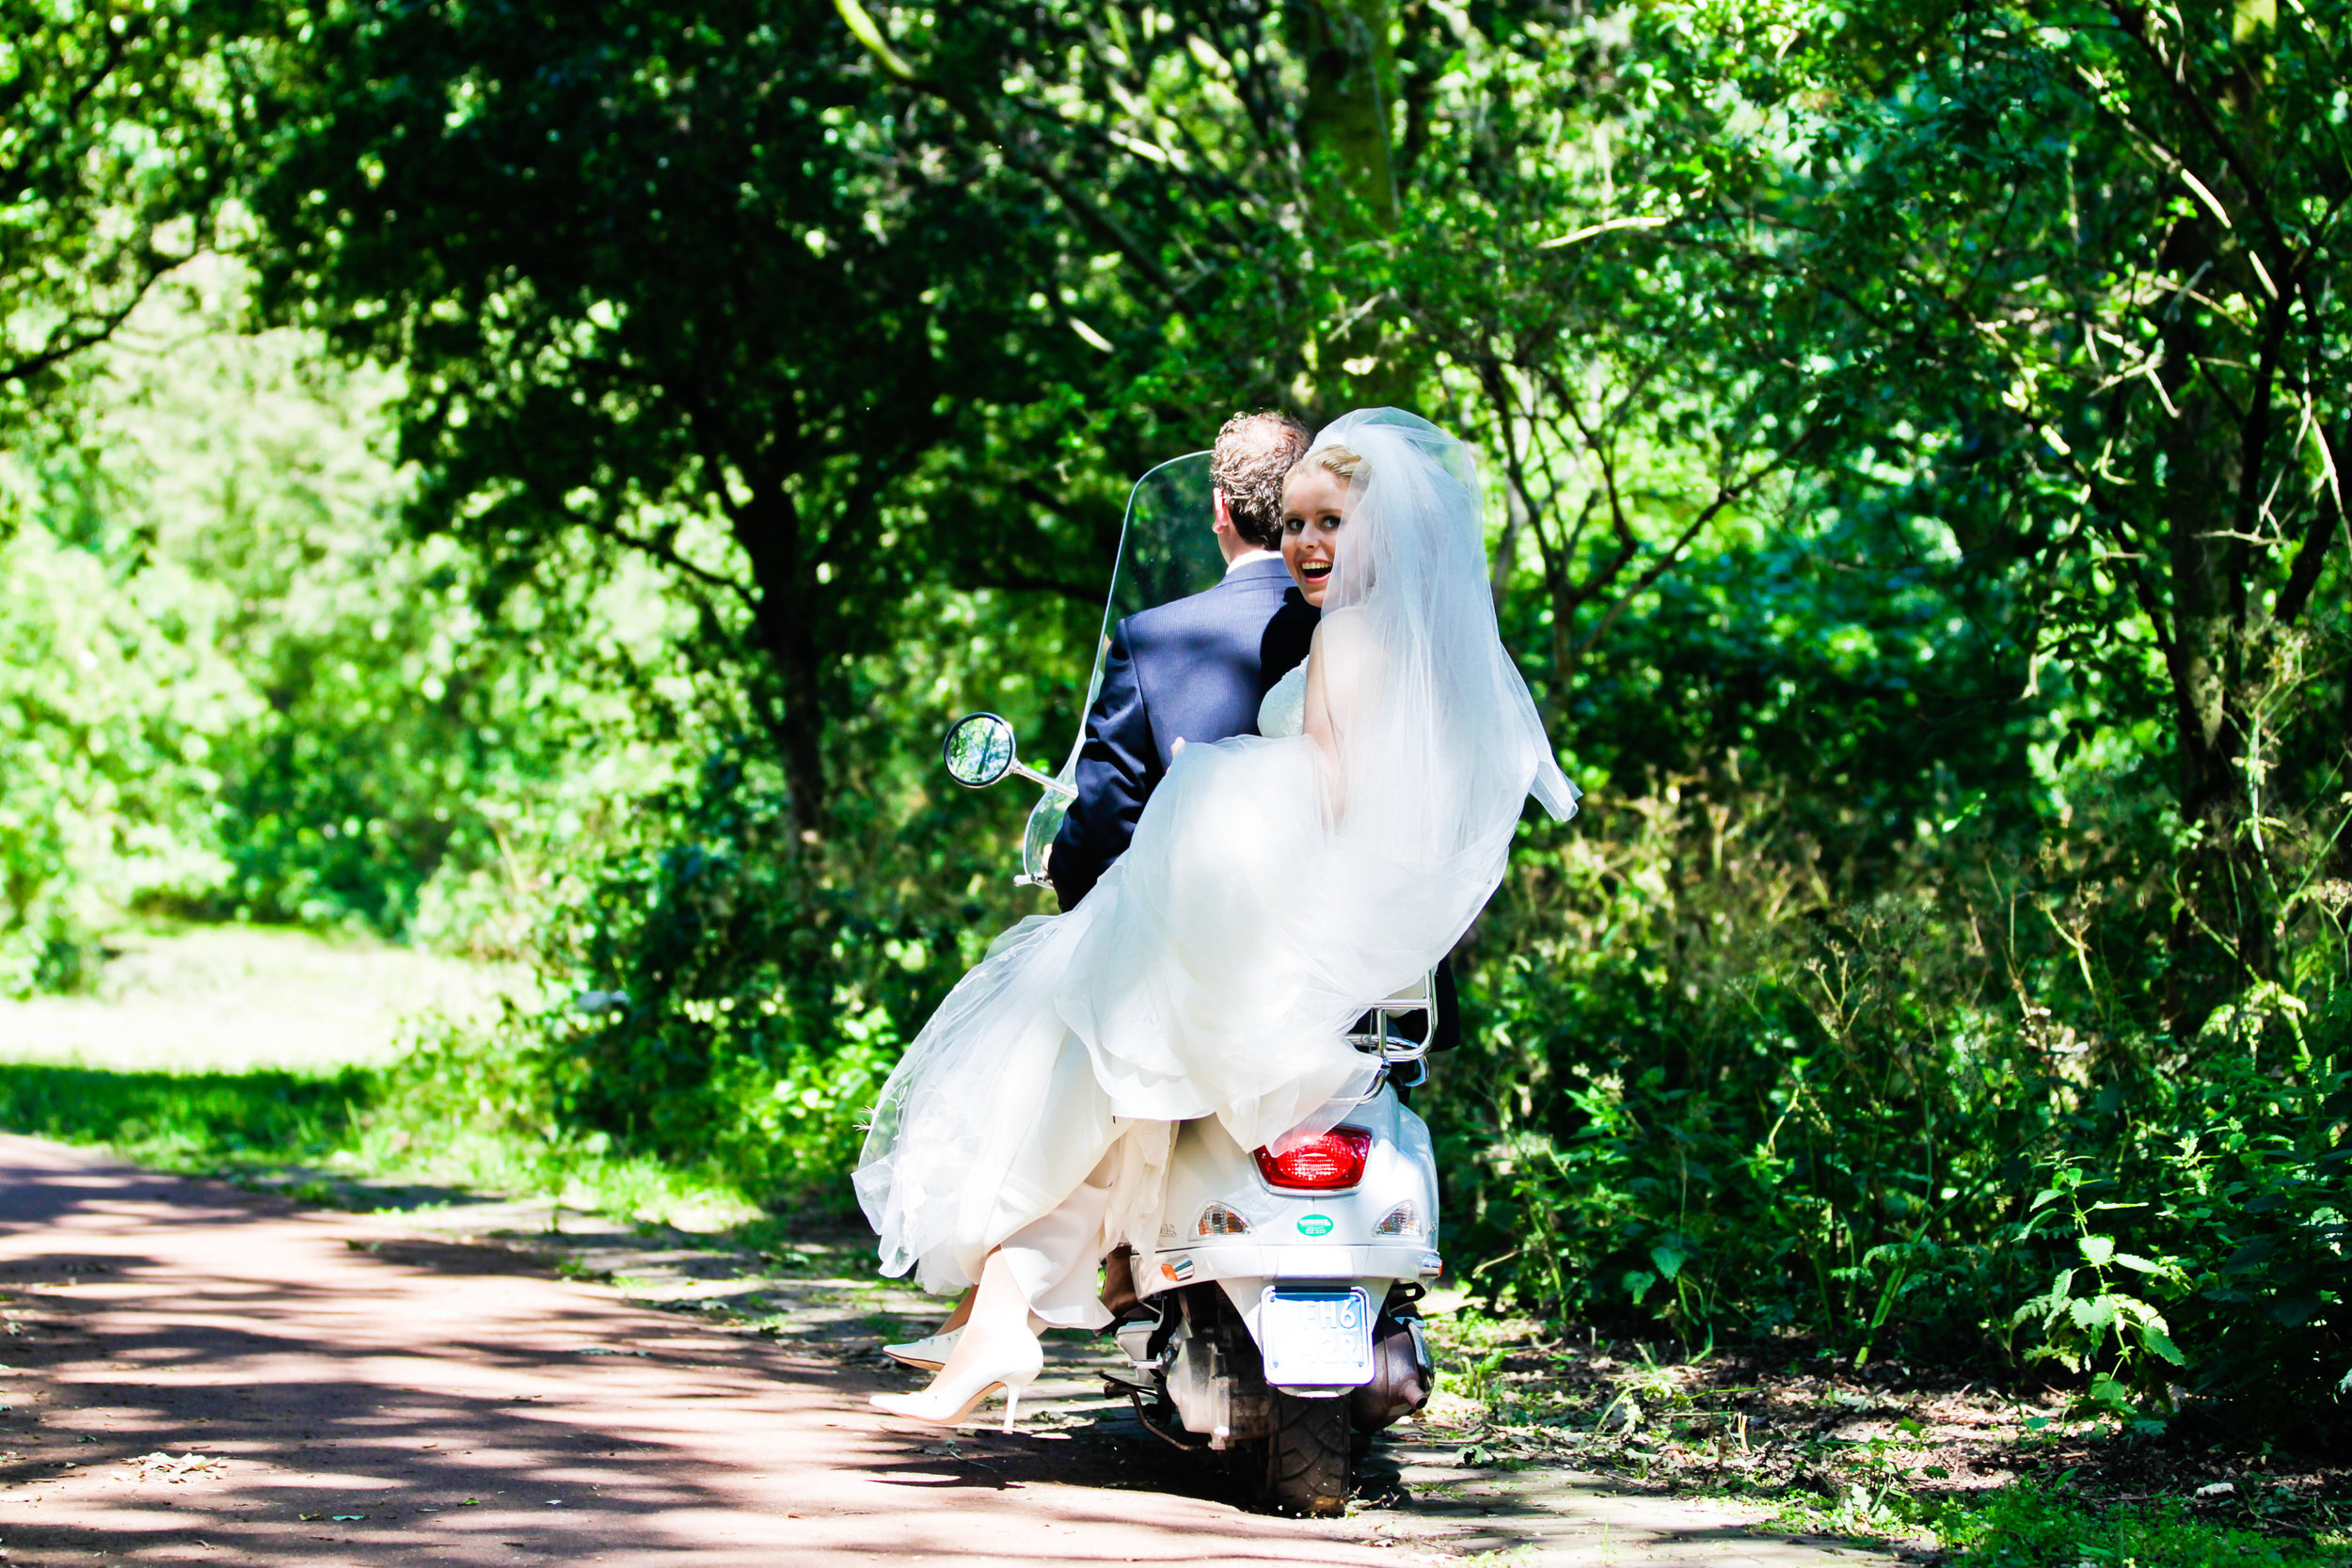 trouwshoot-bruidsfotografie-trouwfoto-feestfotografie-trouwreportage-Laurens en Bettiana556.jpg